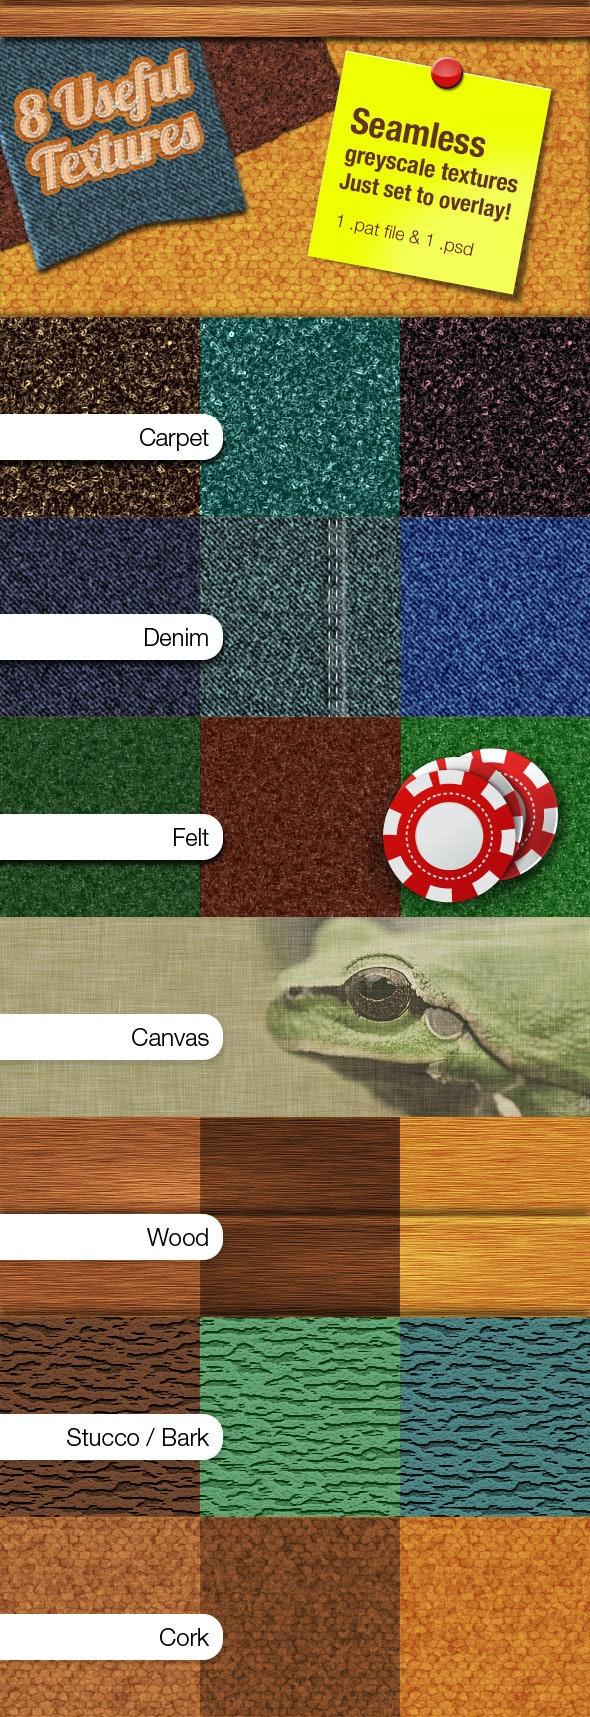 Useful textures - Textures / Fills / Patterns Photoshop